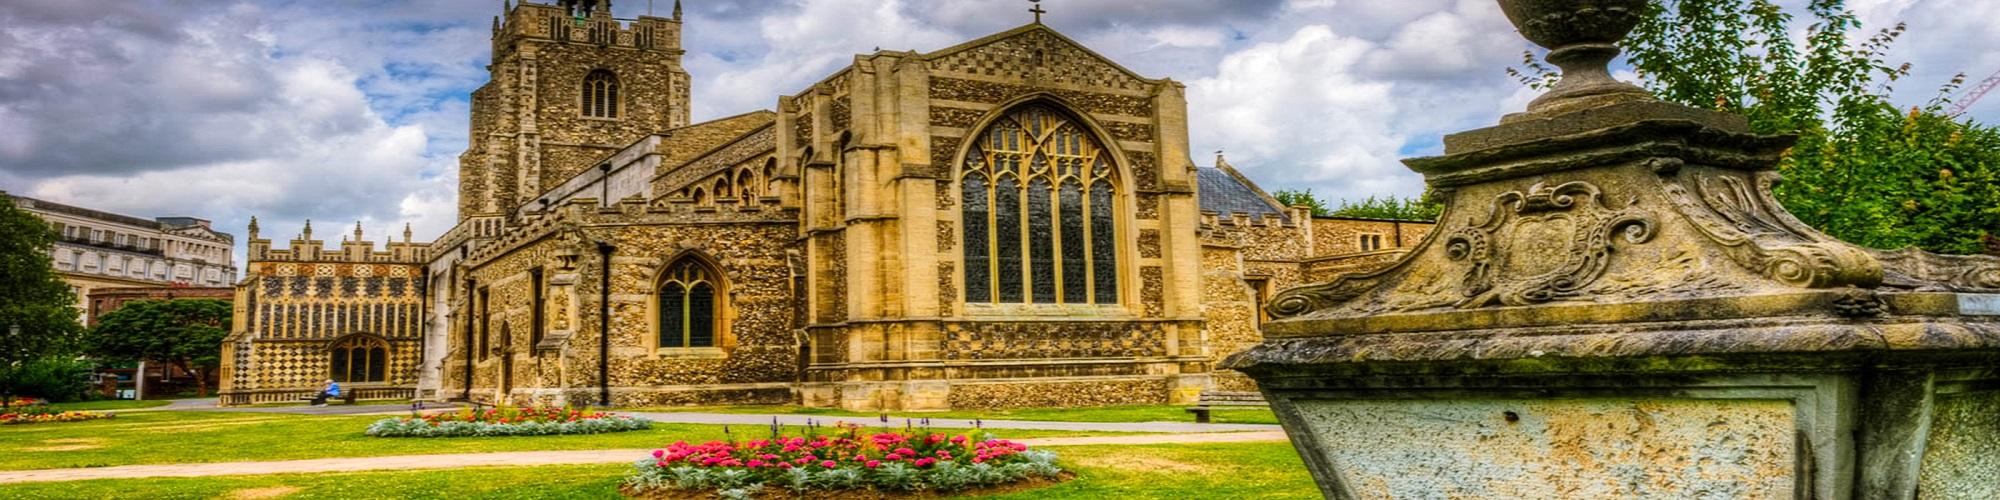 Immagine di destinazione slider vacanze studio di Chelmsford